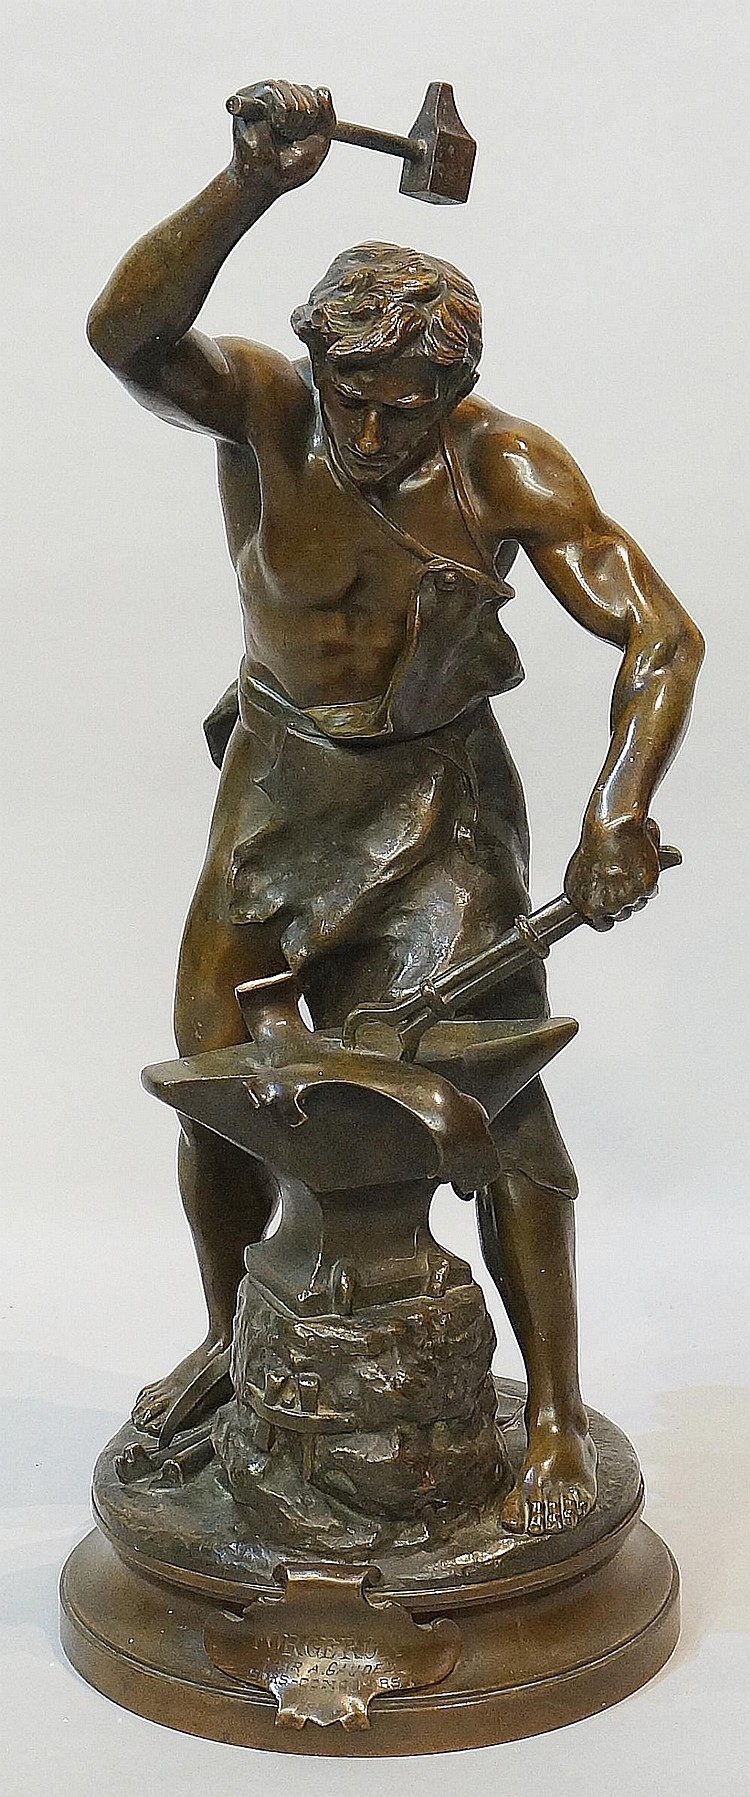 Adrien Etienne Gaudez (1845-1902) - Forgeron, lightly clad blacksmith at th